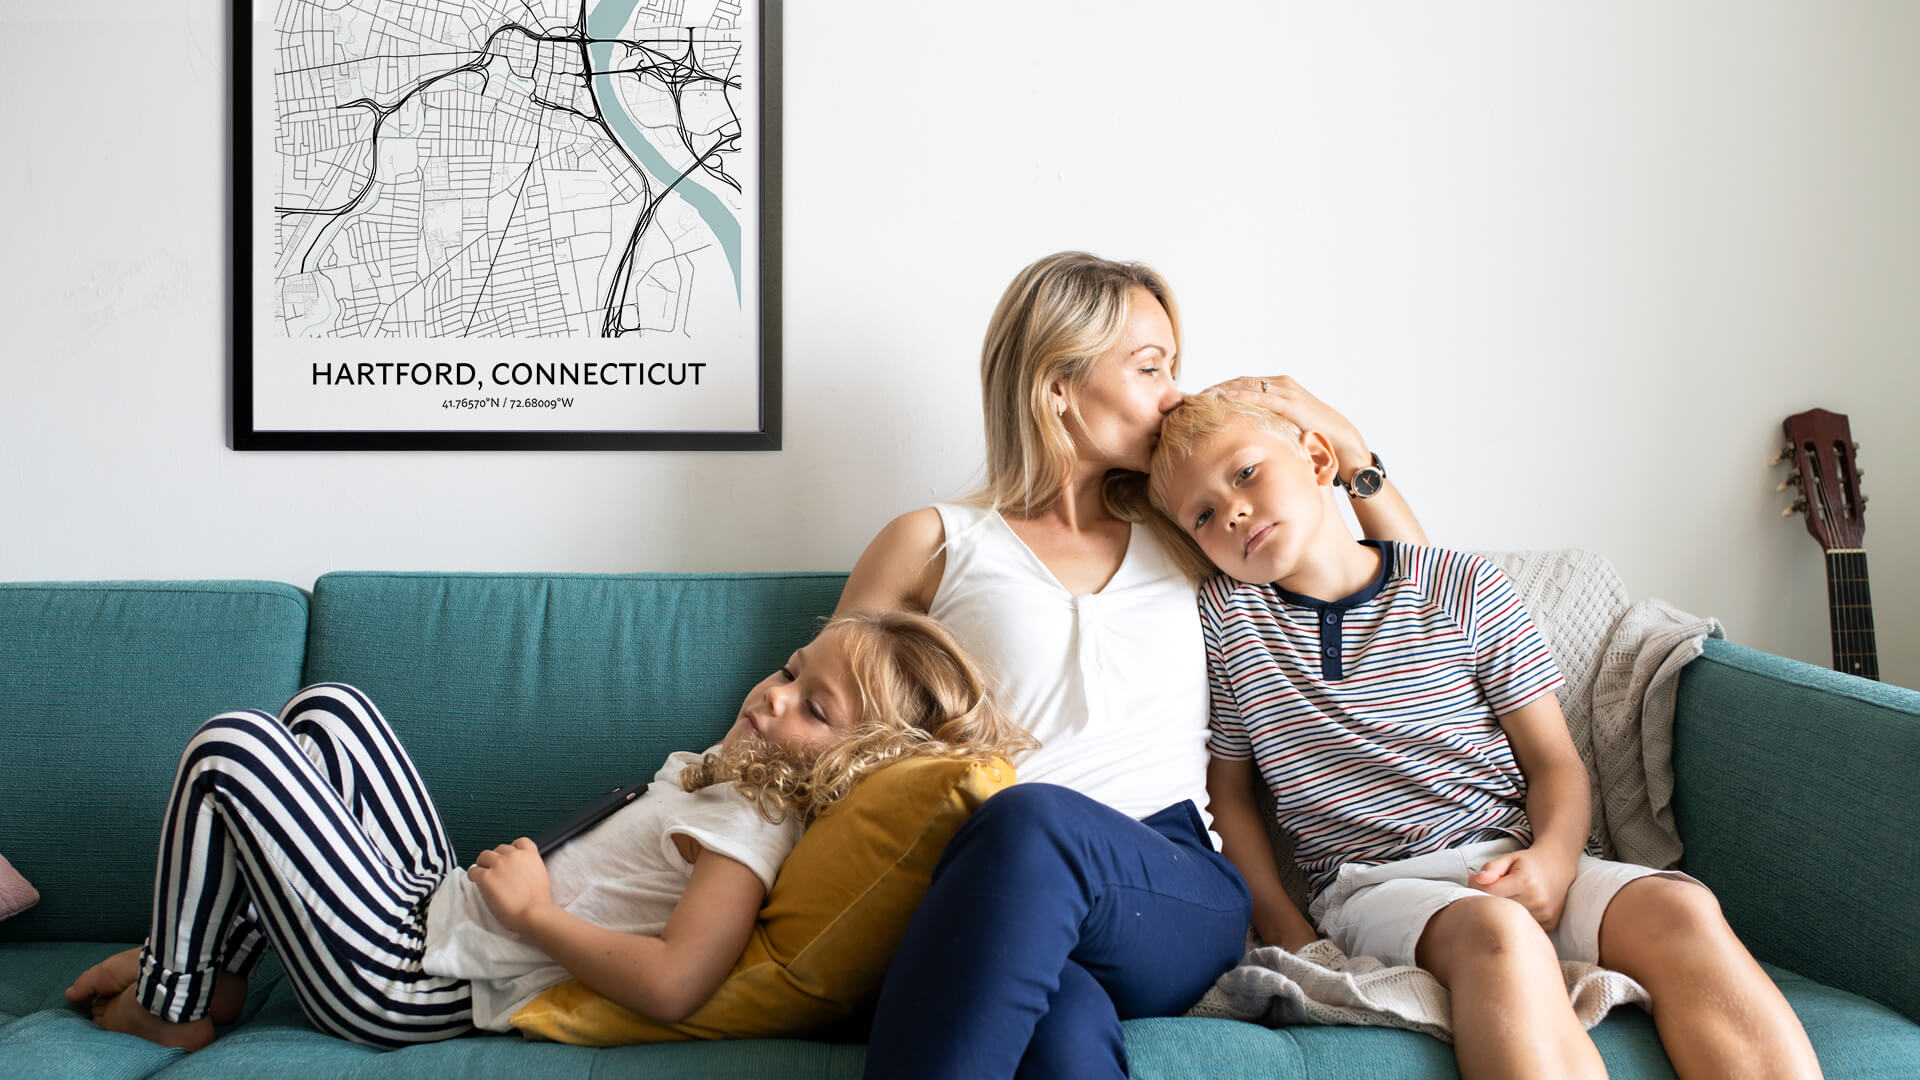 Hartford map poster